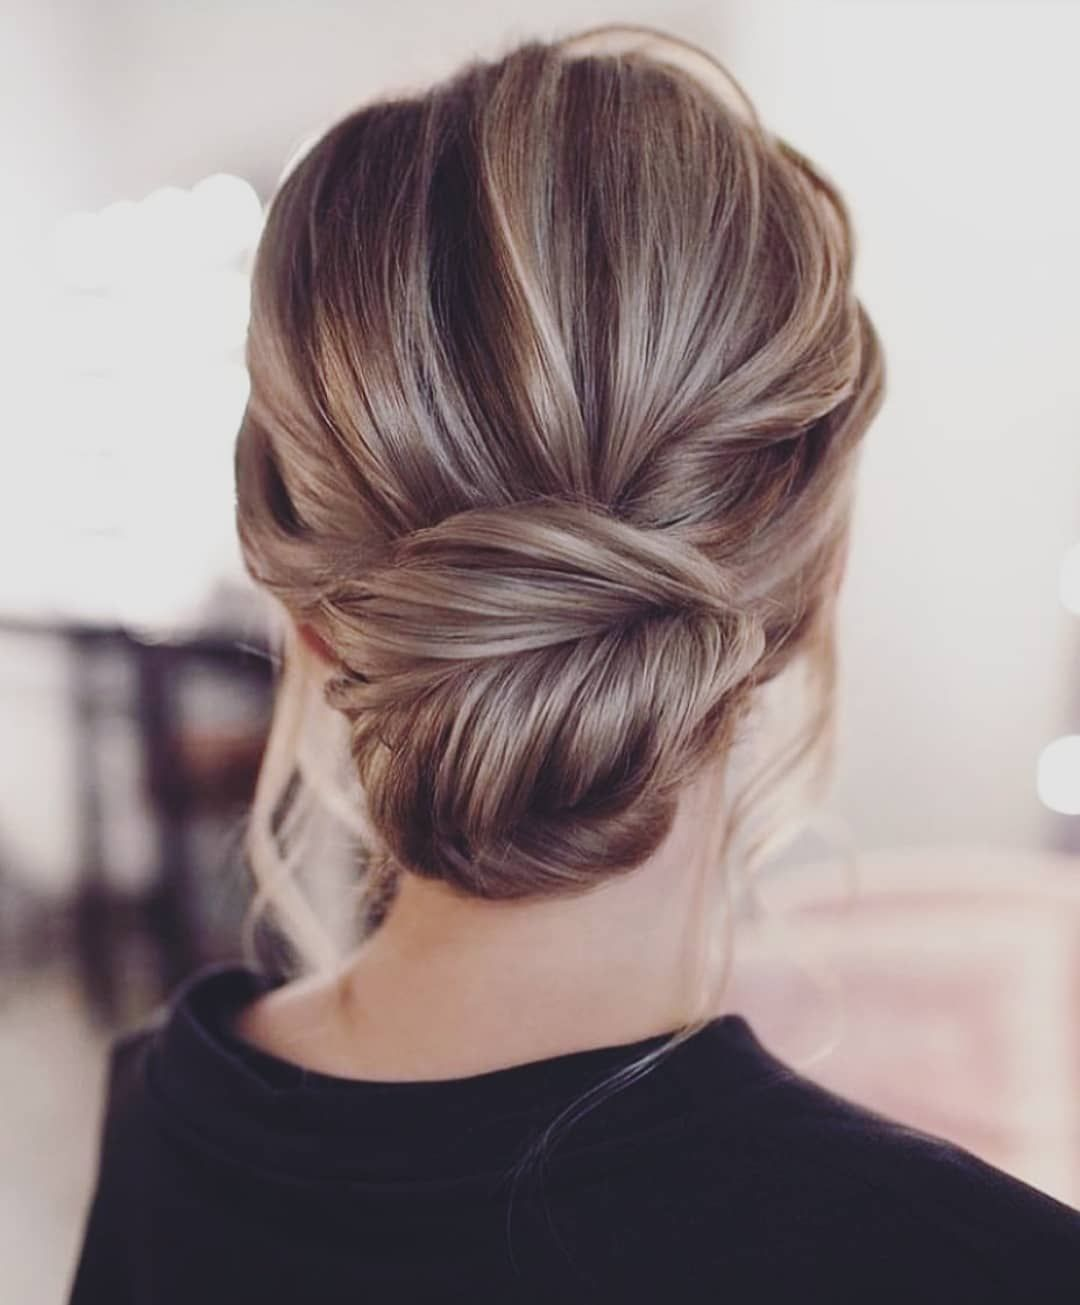 pin by cambridge makeup artist - mua/ hair stylist on